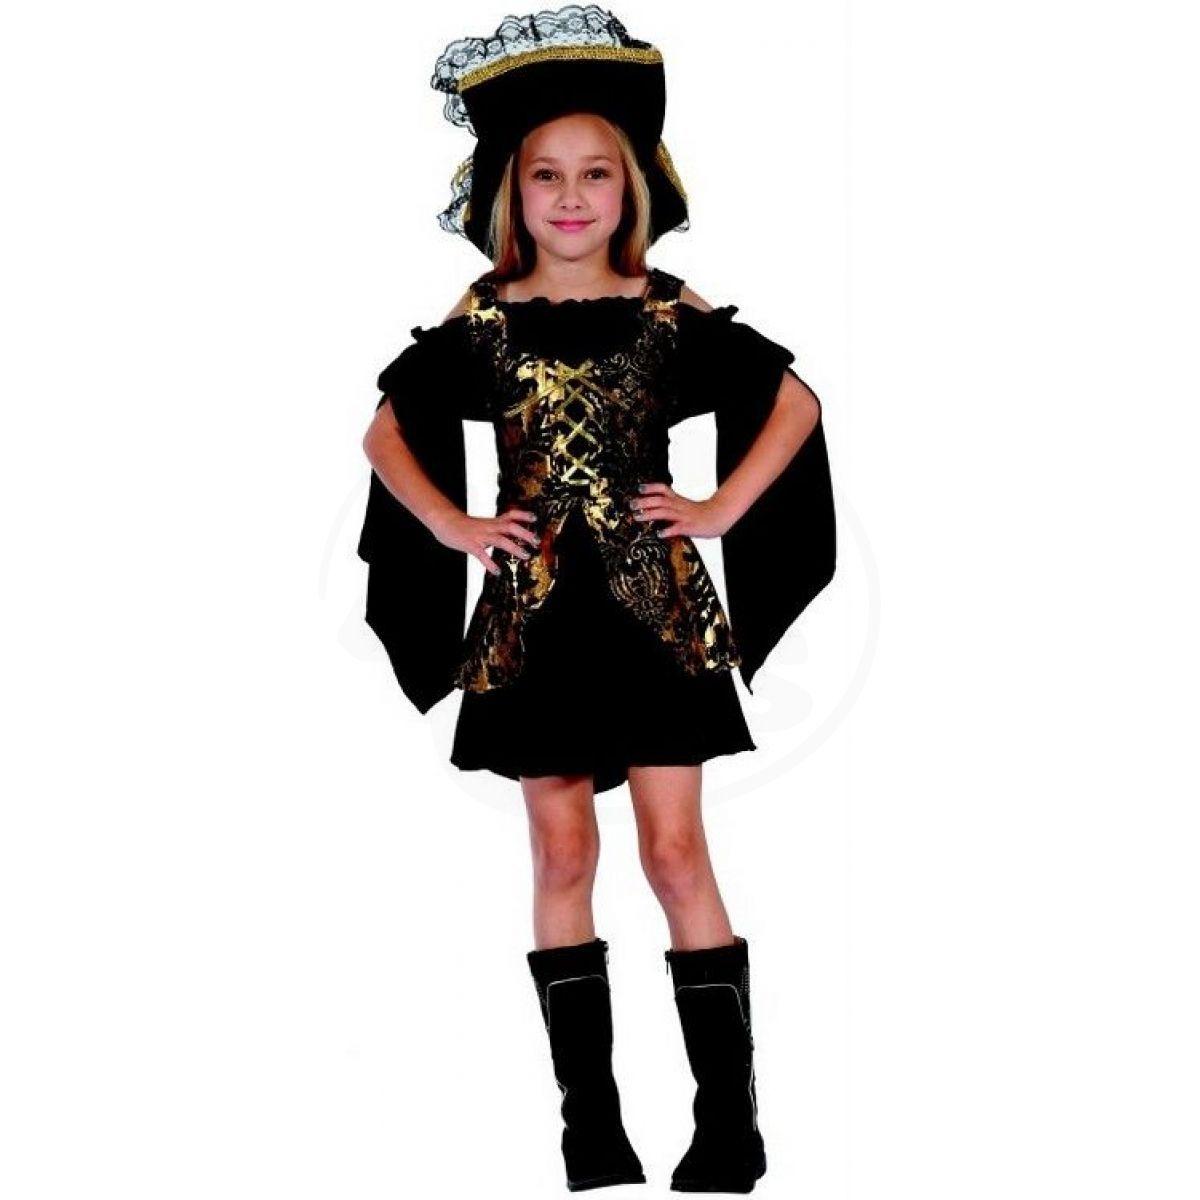 Made Dětský karnevalový kostým Korzárka M 120 - 130 cm 8d9422f1269